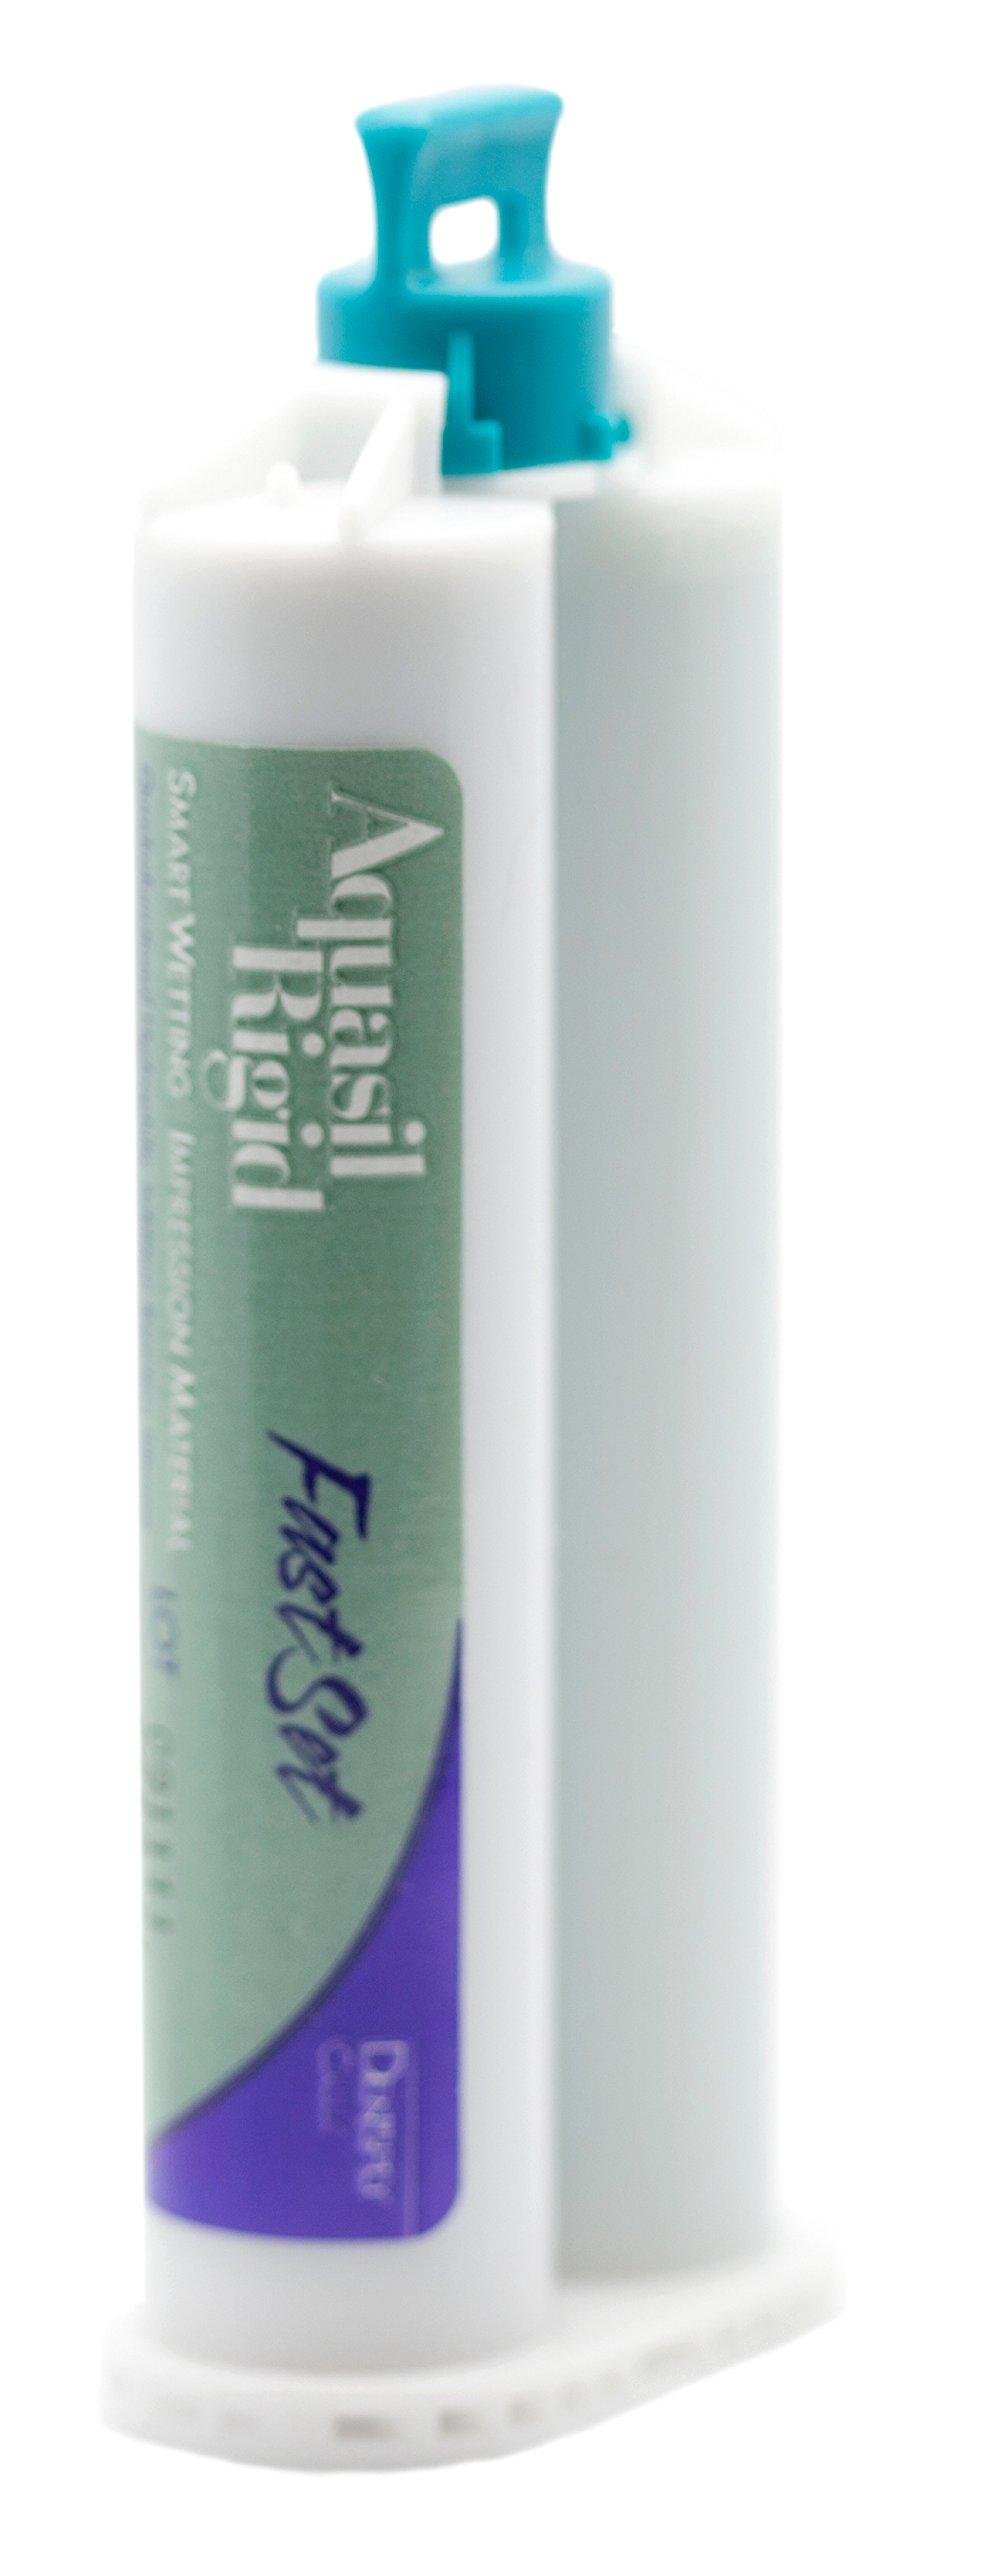 Dentsply 678355 Aquasil Smart Wetting Impression Material, Cartridge Refill, Rigid, Fast Set, Light Green, 50ml